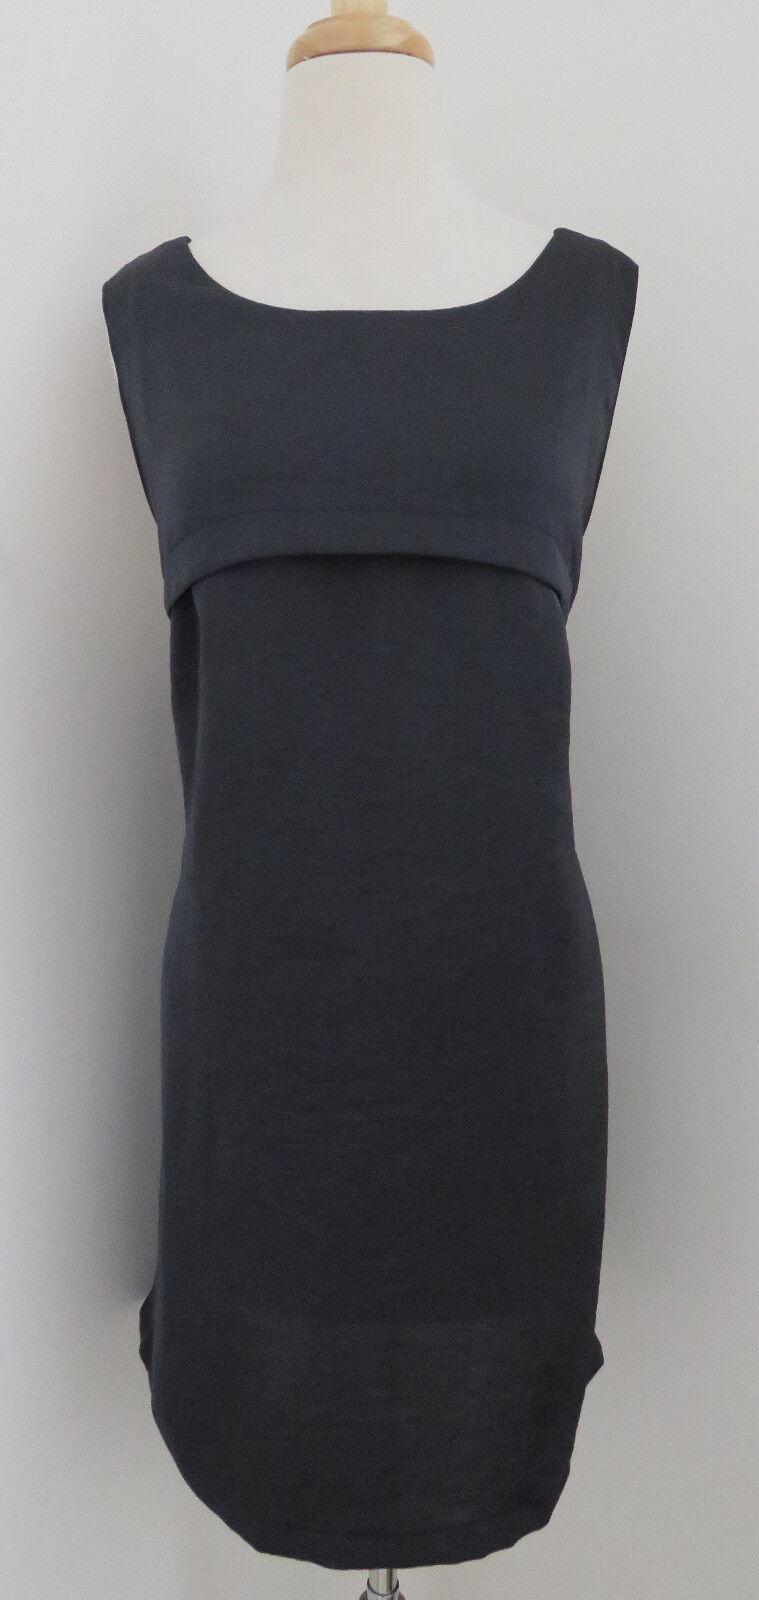 SURFACE TO AIR Draped back shift dress sz 3 M L